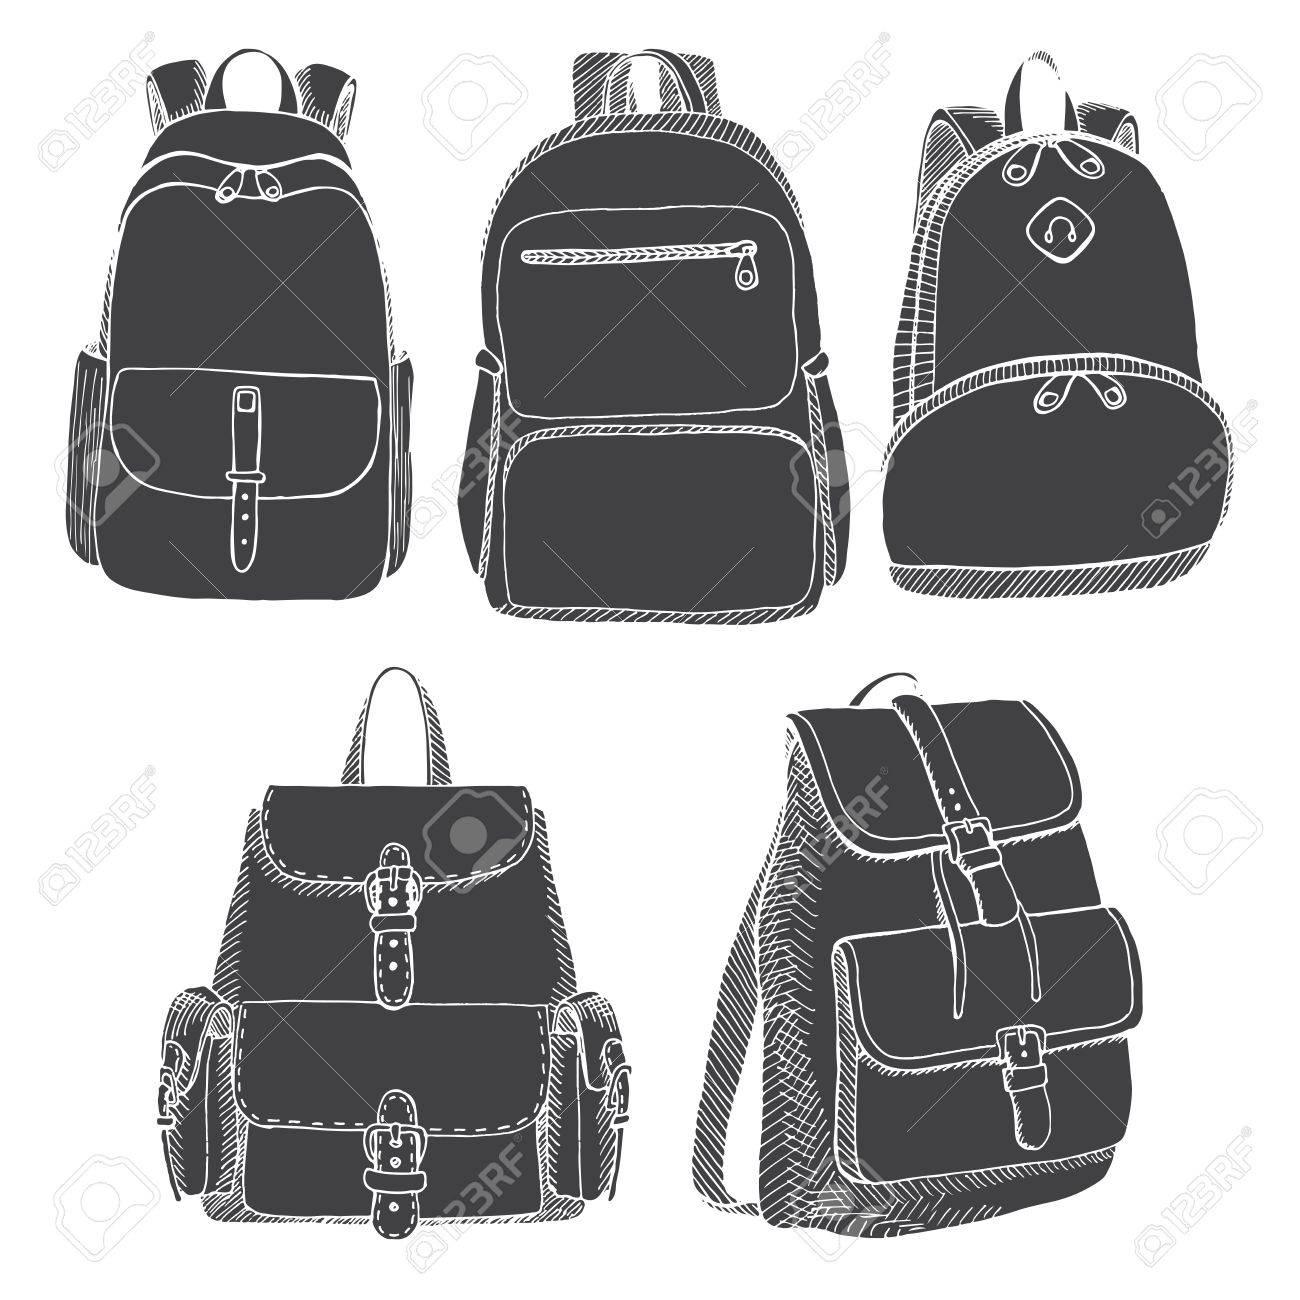 55c91fbf1c Set Of Different Backpacks